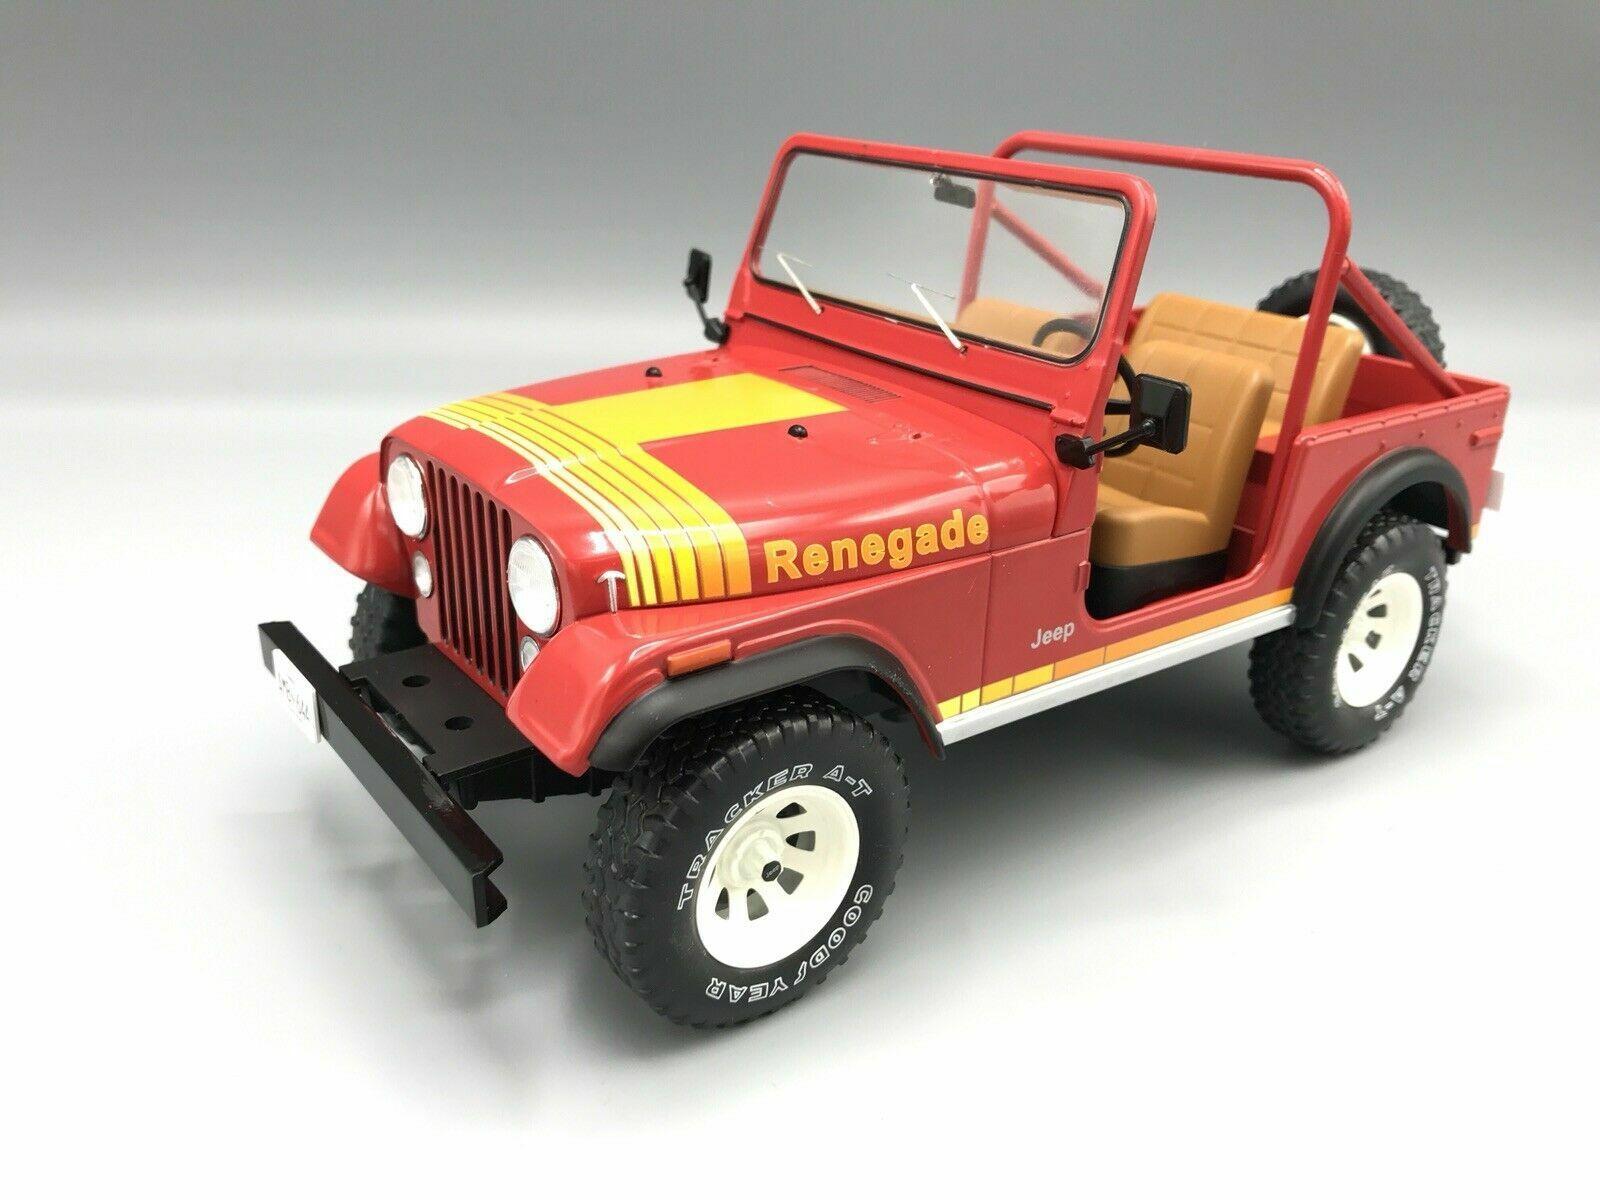 1 18 MCG 18110 1976 Jeep CJ-Renegade  rouge Nouveauté  100% garantie de prix